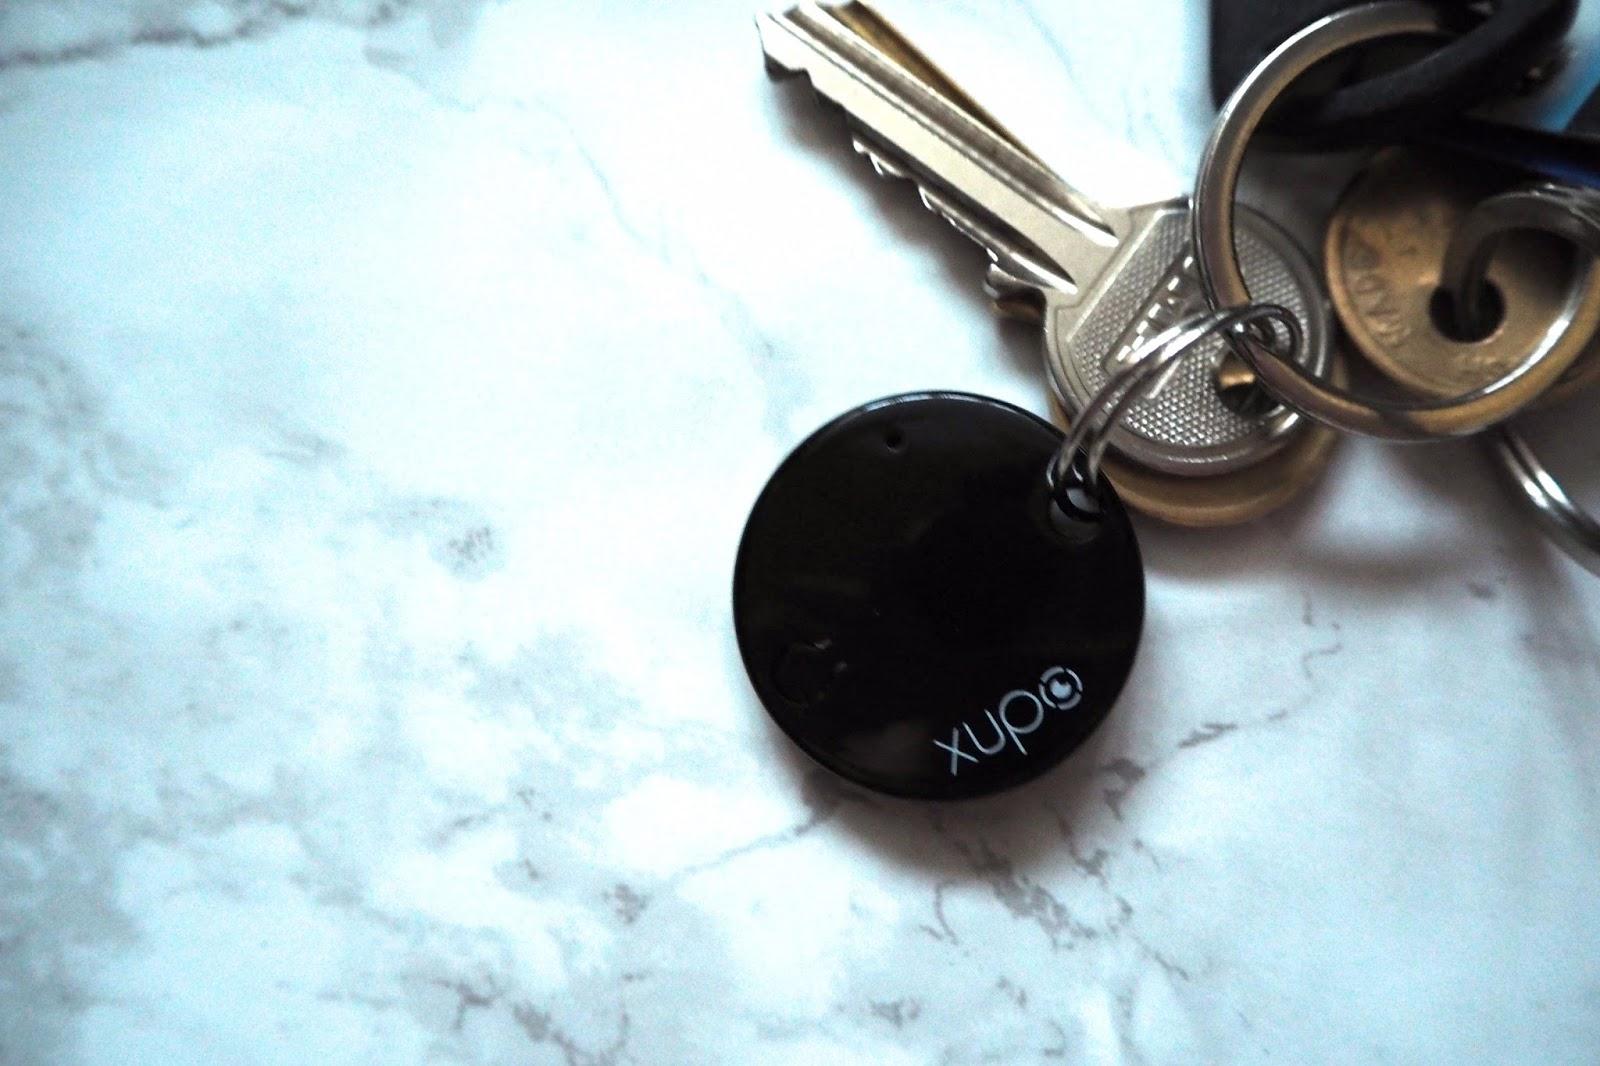 Xupo on keys